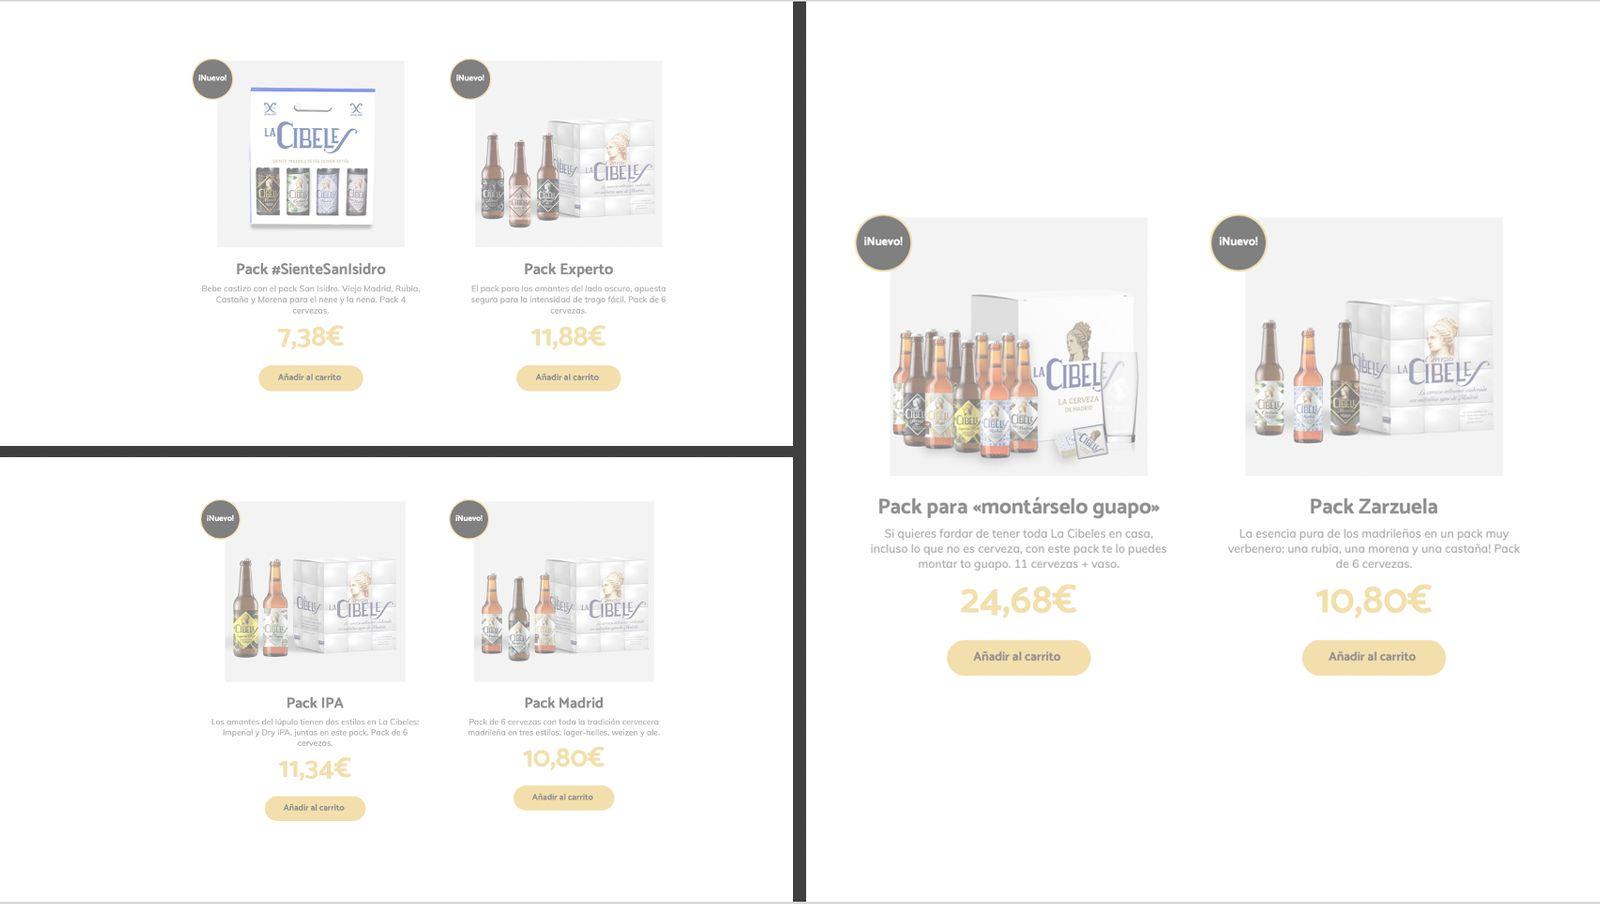 La Cibeles - Tienda online